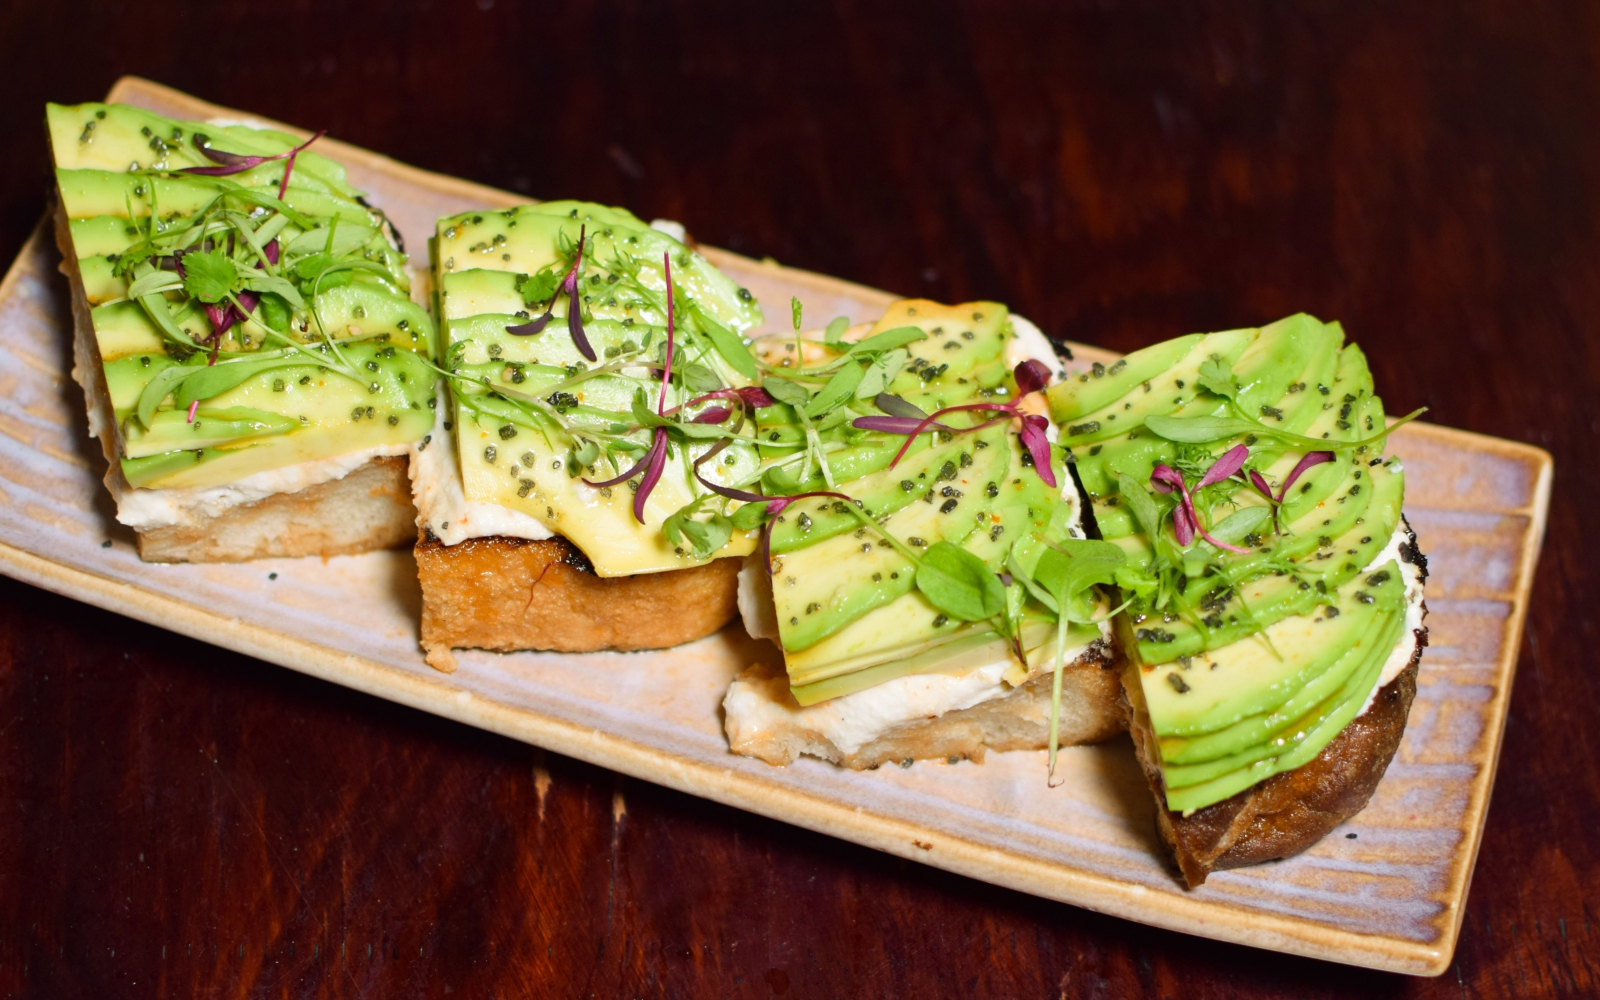 Vegan Avocado and Tofu Ricotta Sourdough Toast